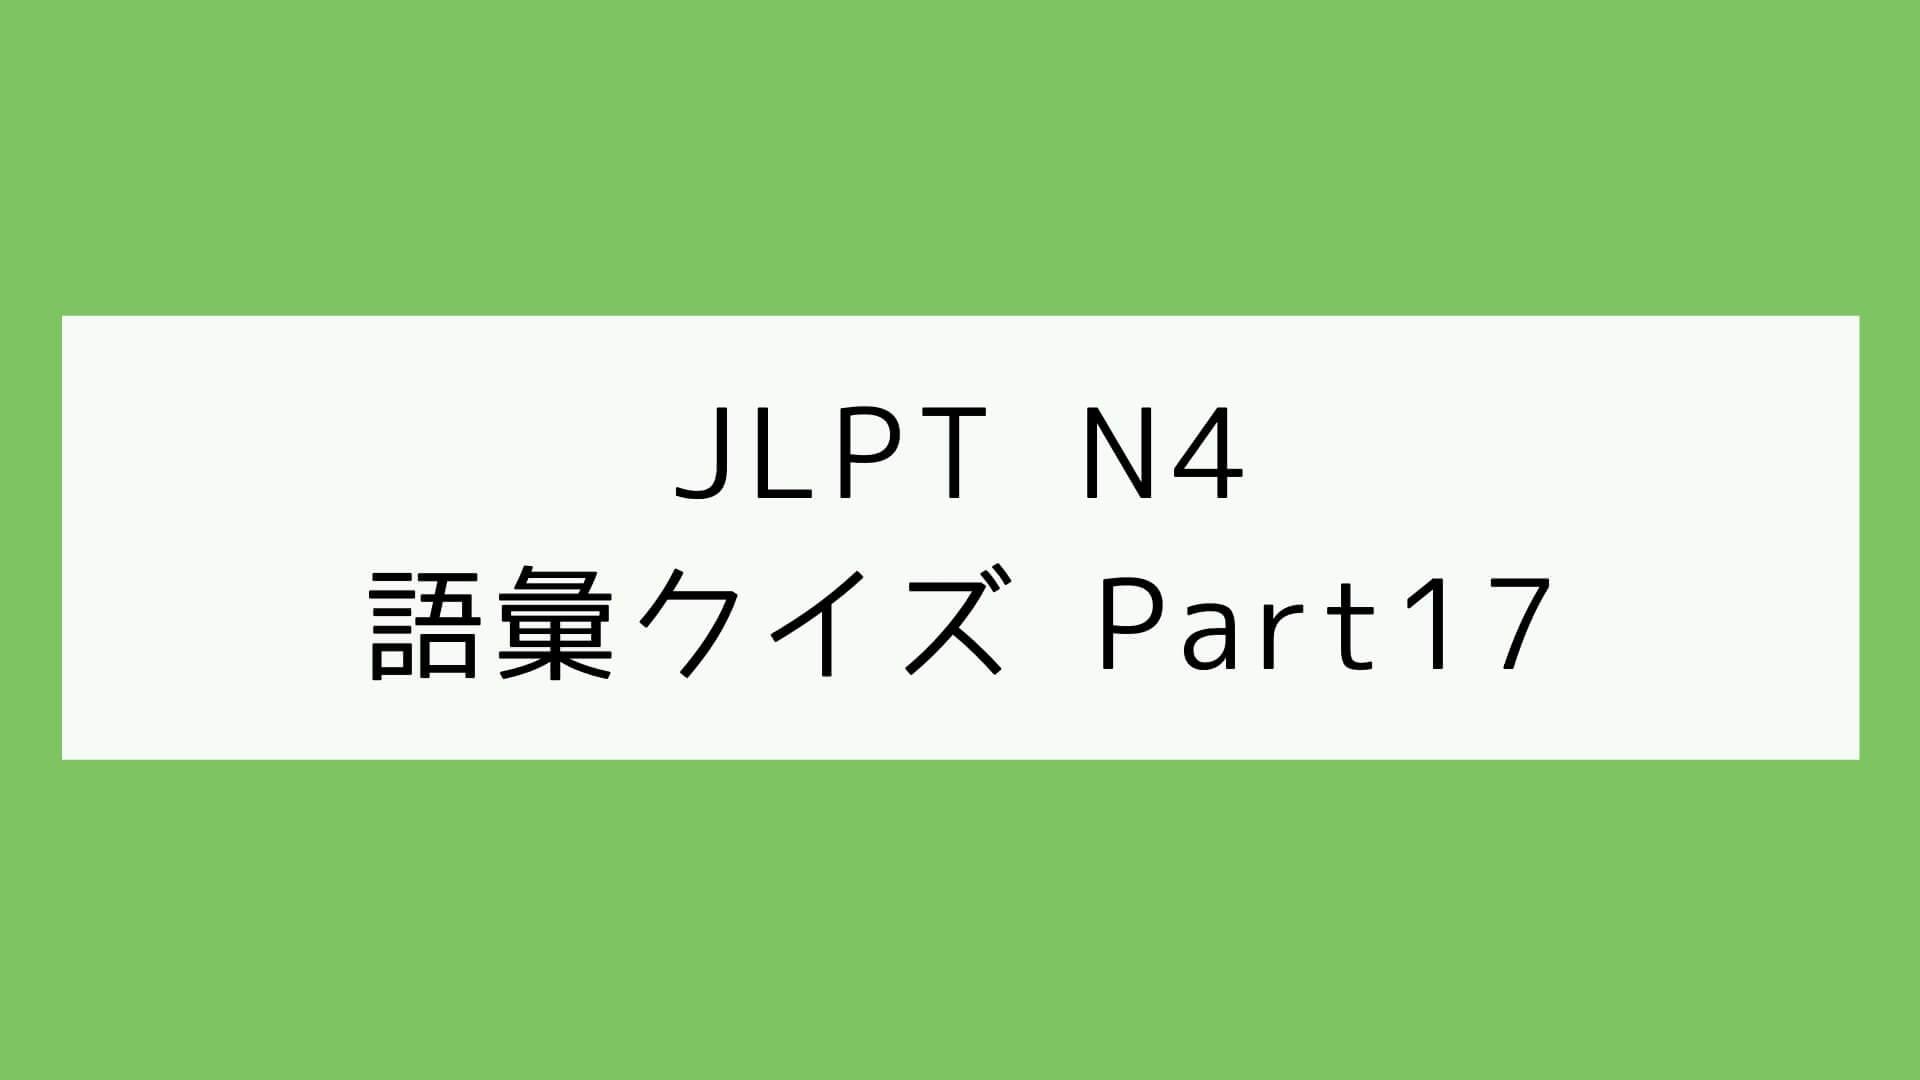 【JLPT N4】語彙クイズ Part17